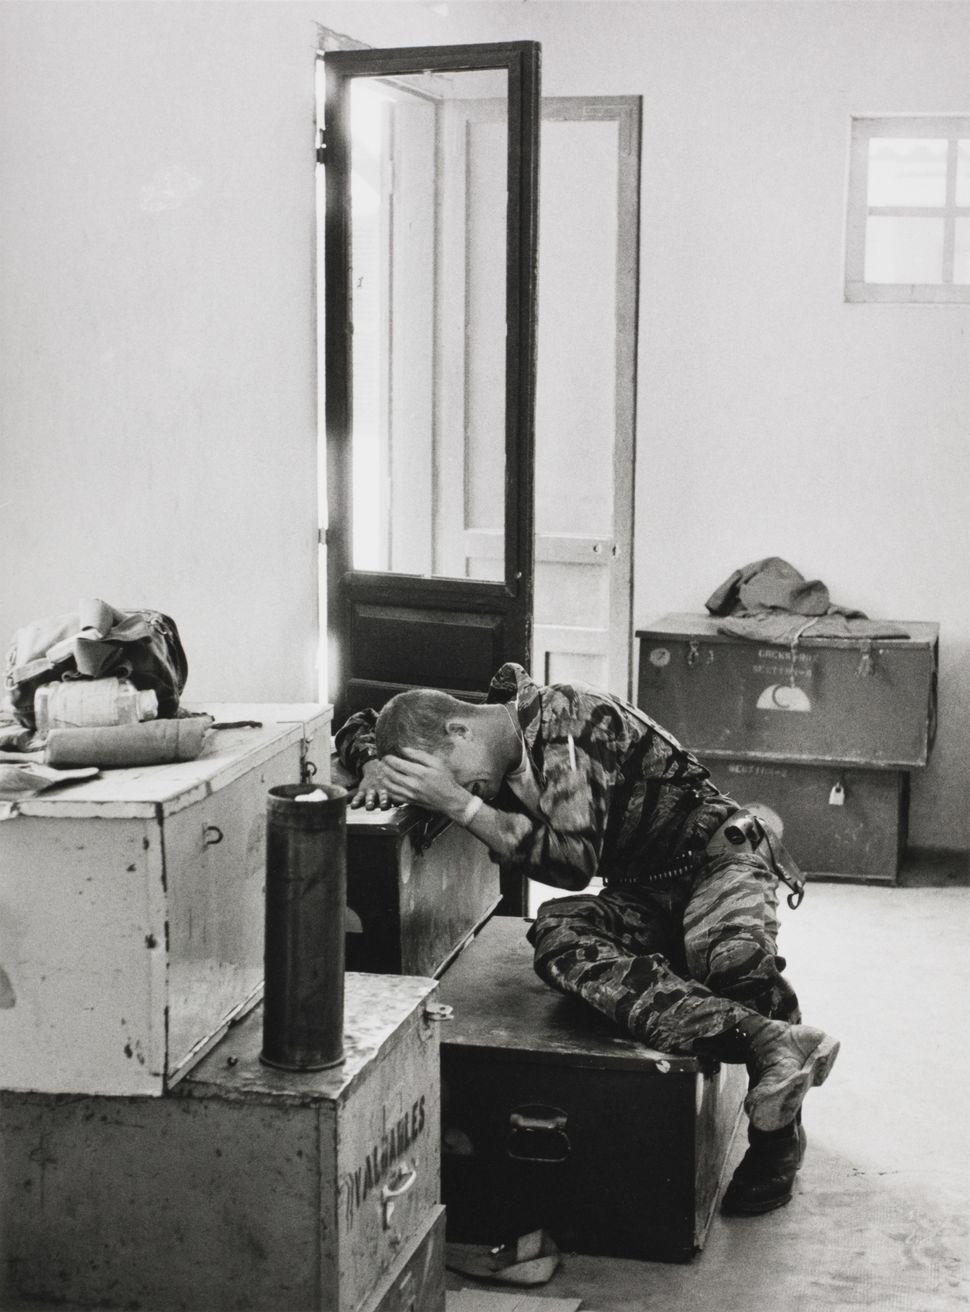 Larry Burrows, Βρετανός (1926–1971). Μετά το τέλος της αποστολής, αυτός ο στρατιώτης αφήνει τον εαυτό του ελεύθερο,  1965